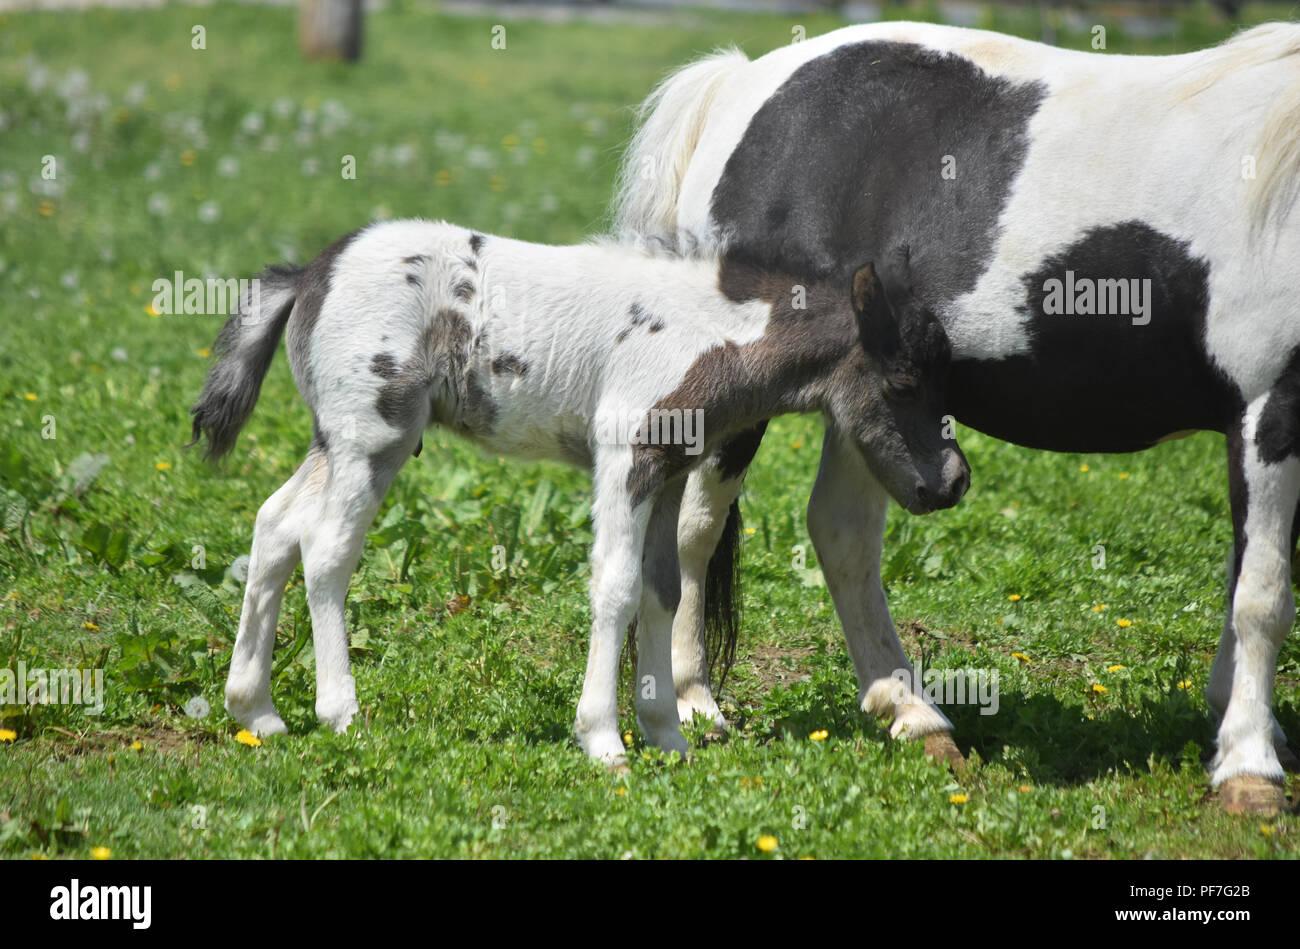 Beautiful Sweet Baby Black And White Paint Miniature Horse Stock Photo Alamy